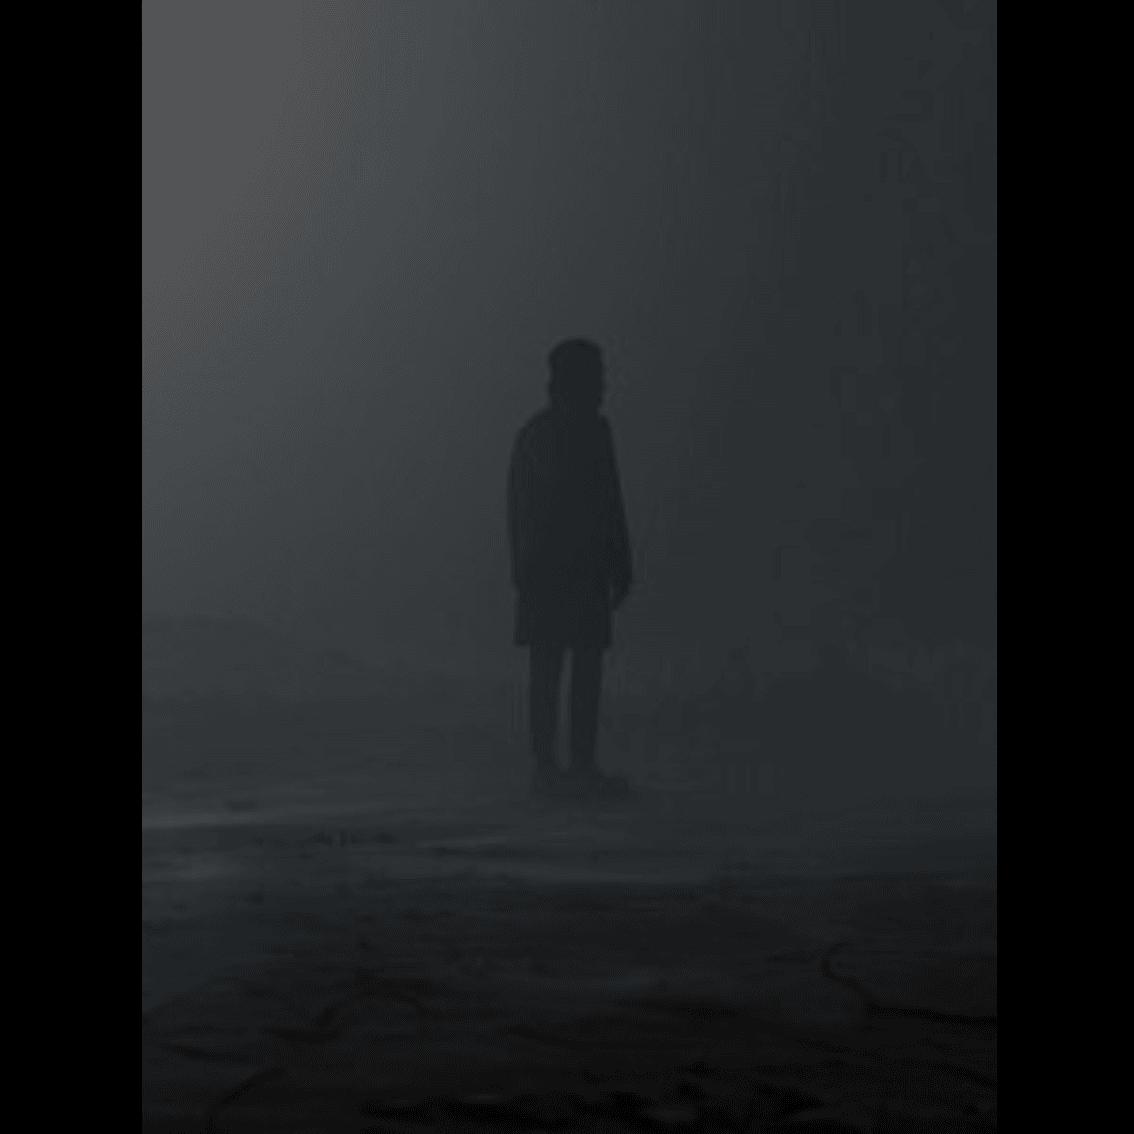 playlist dark light on spotify by Mathieu Levesque